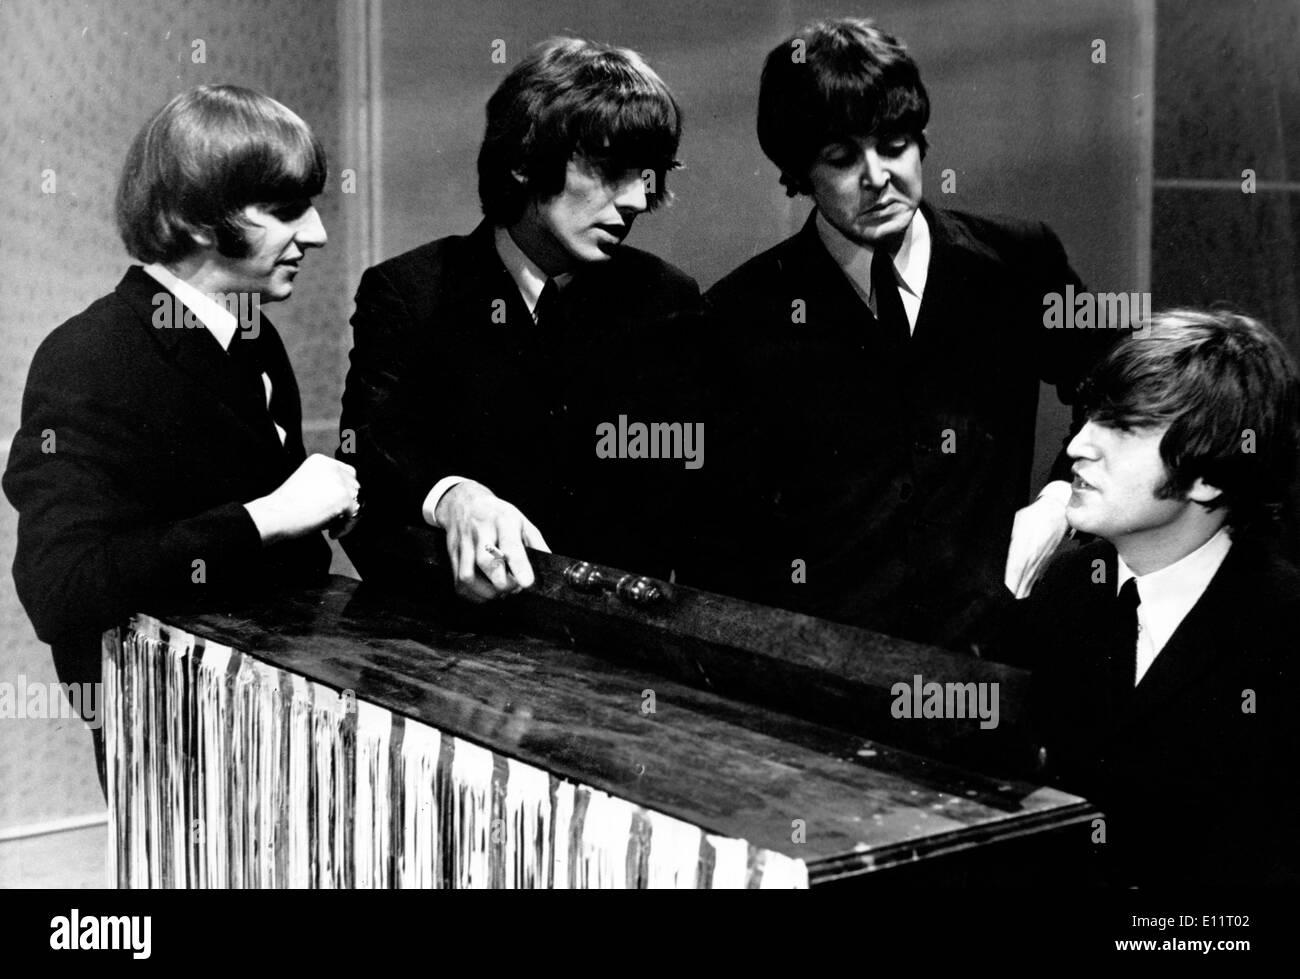 The Beatles RINGO STARR, GEORGE HARRISON, PAUL McCARTNEY, JOHN LENNON during recording session - Stock Image